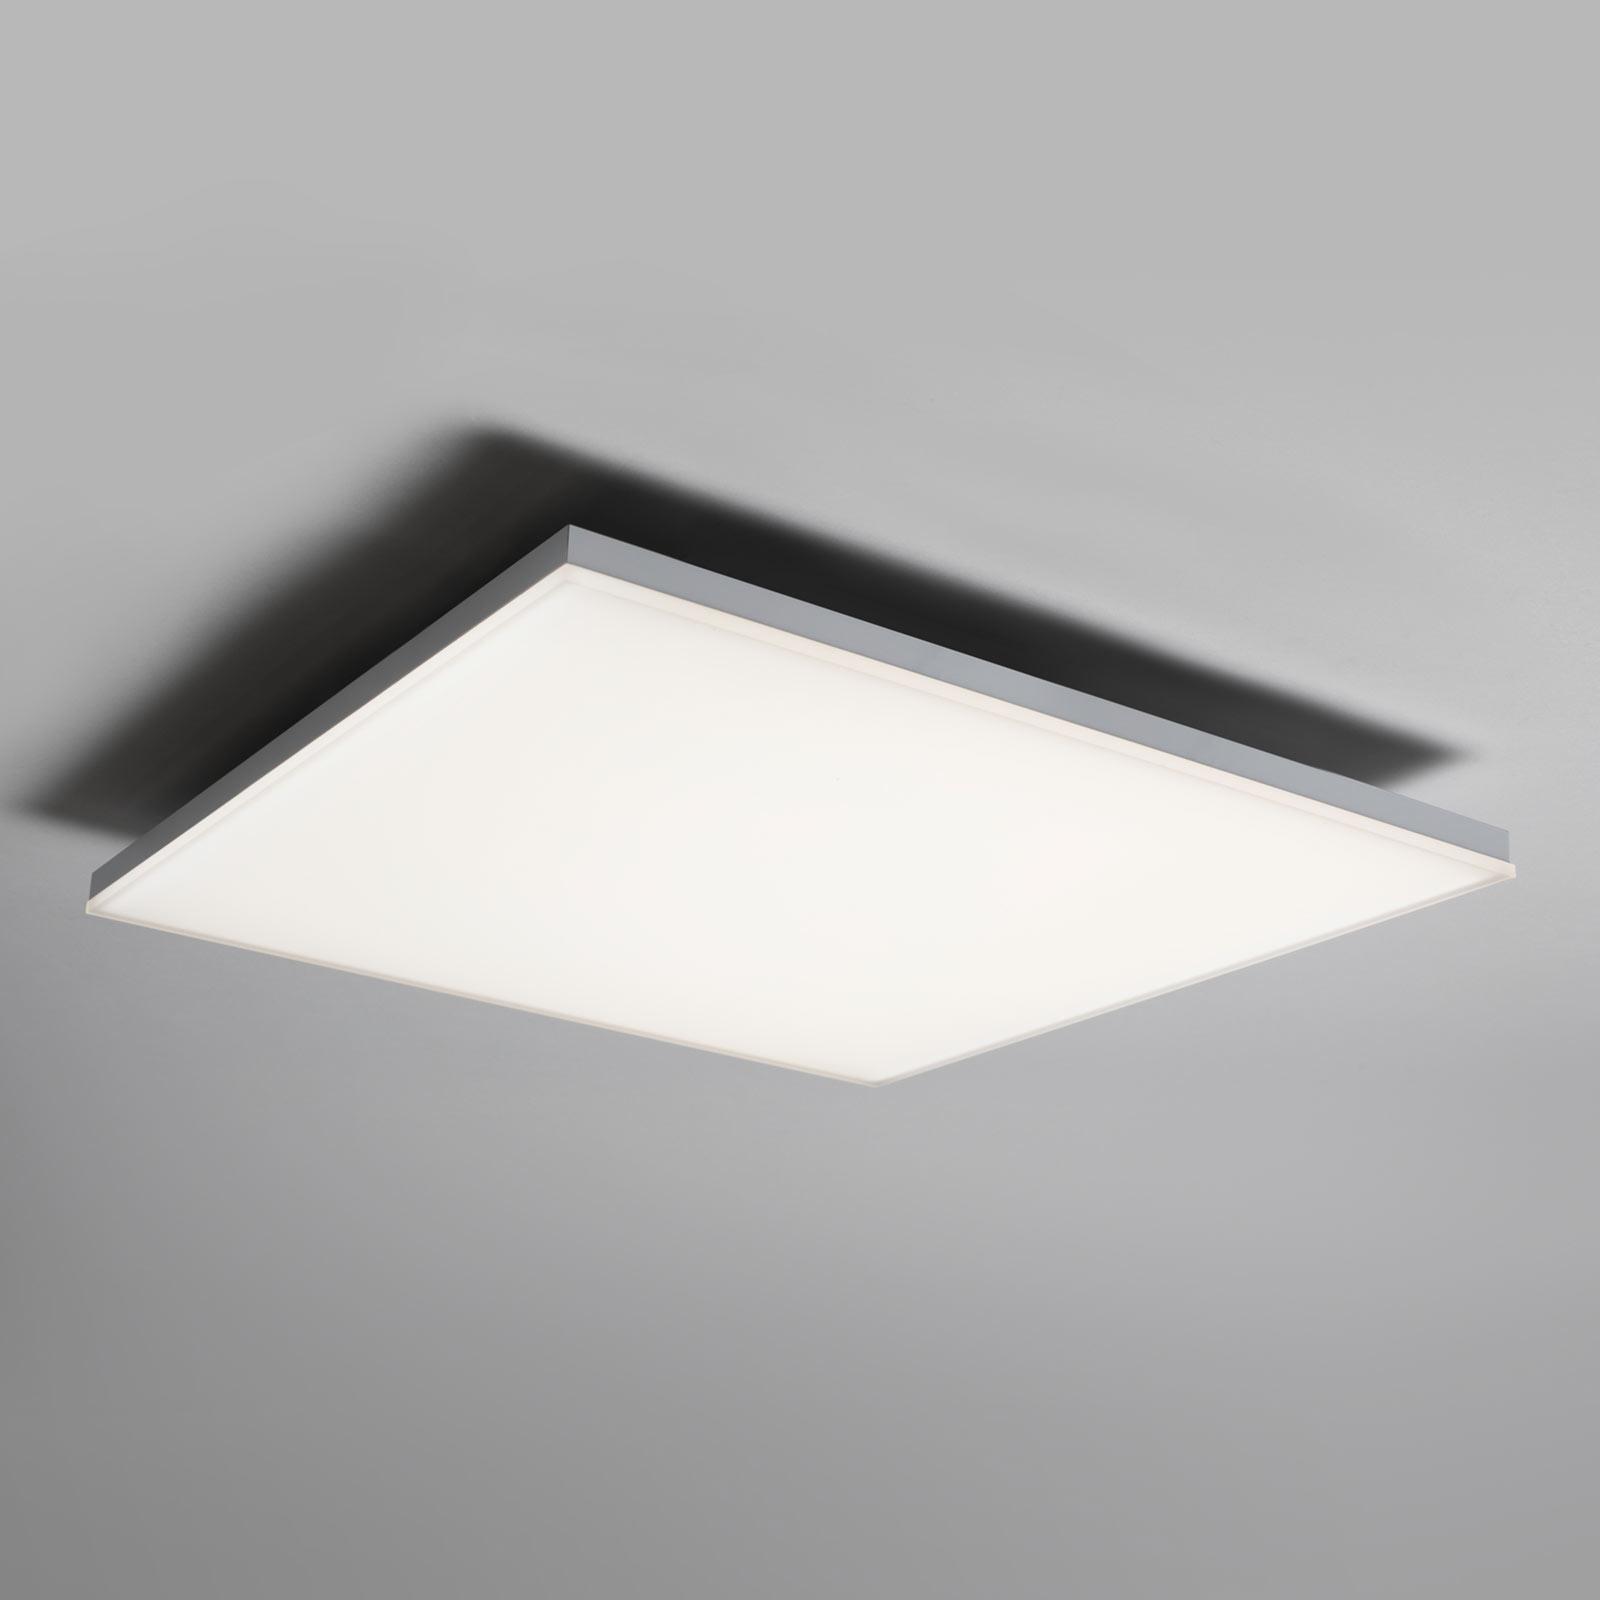 LEDVANCE Planon Frameless lampa sufitowa 60x60 830